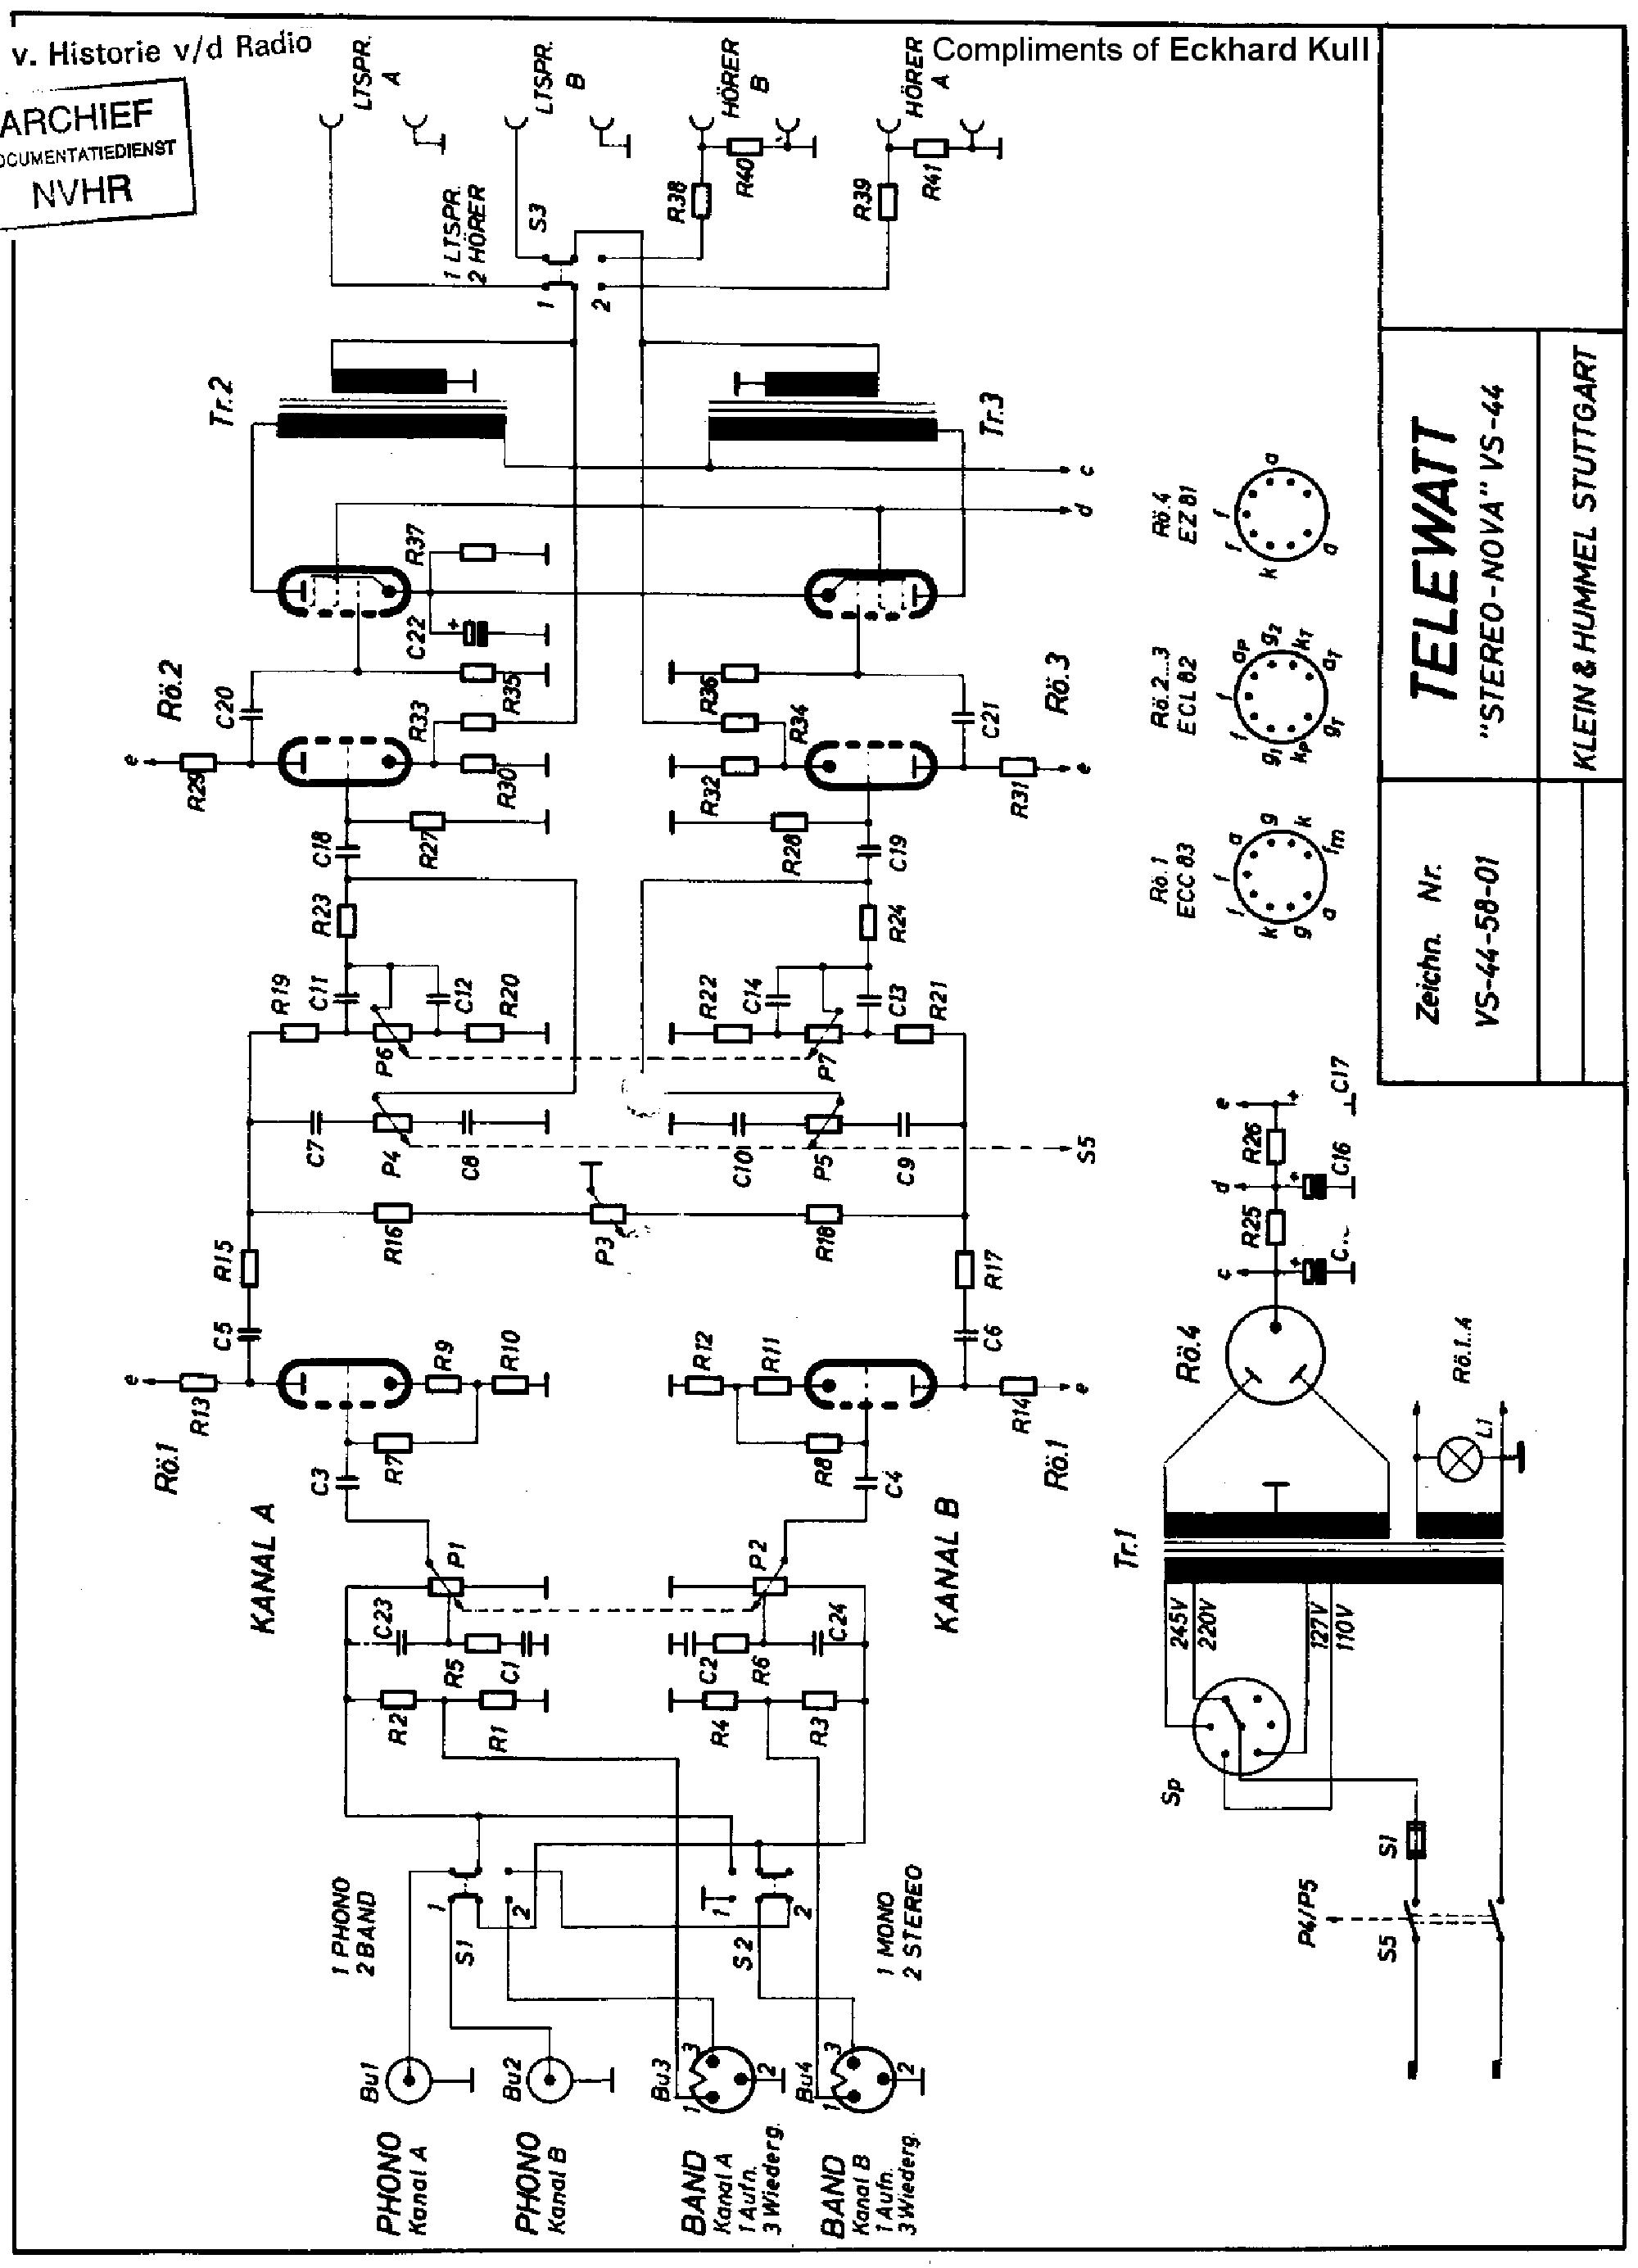 Schön 1970 Nova Schaltplan Ideen - Elektrische Schaltplan-Ideen ...